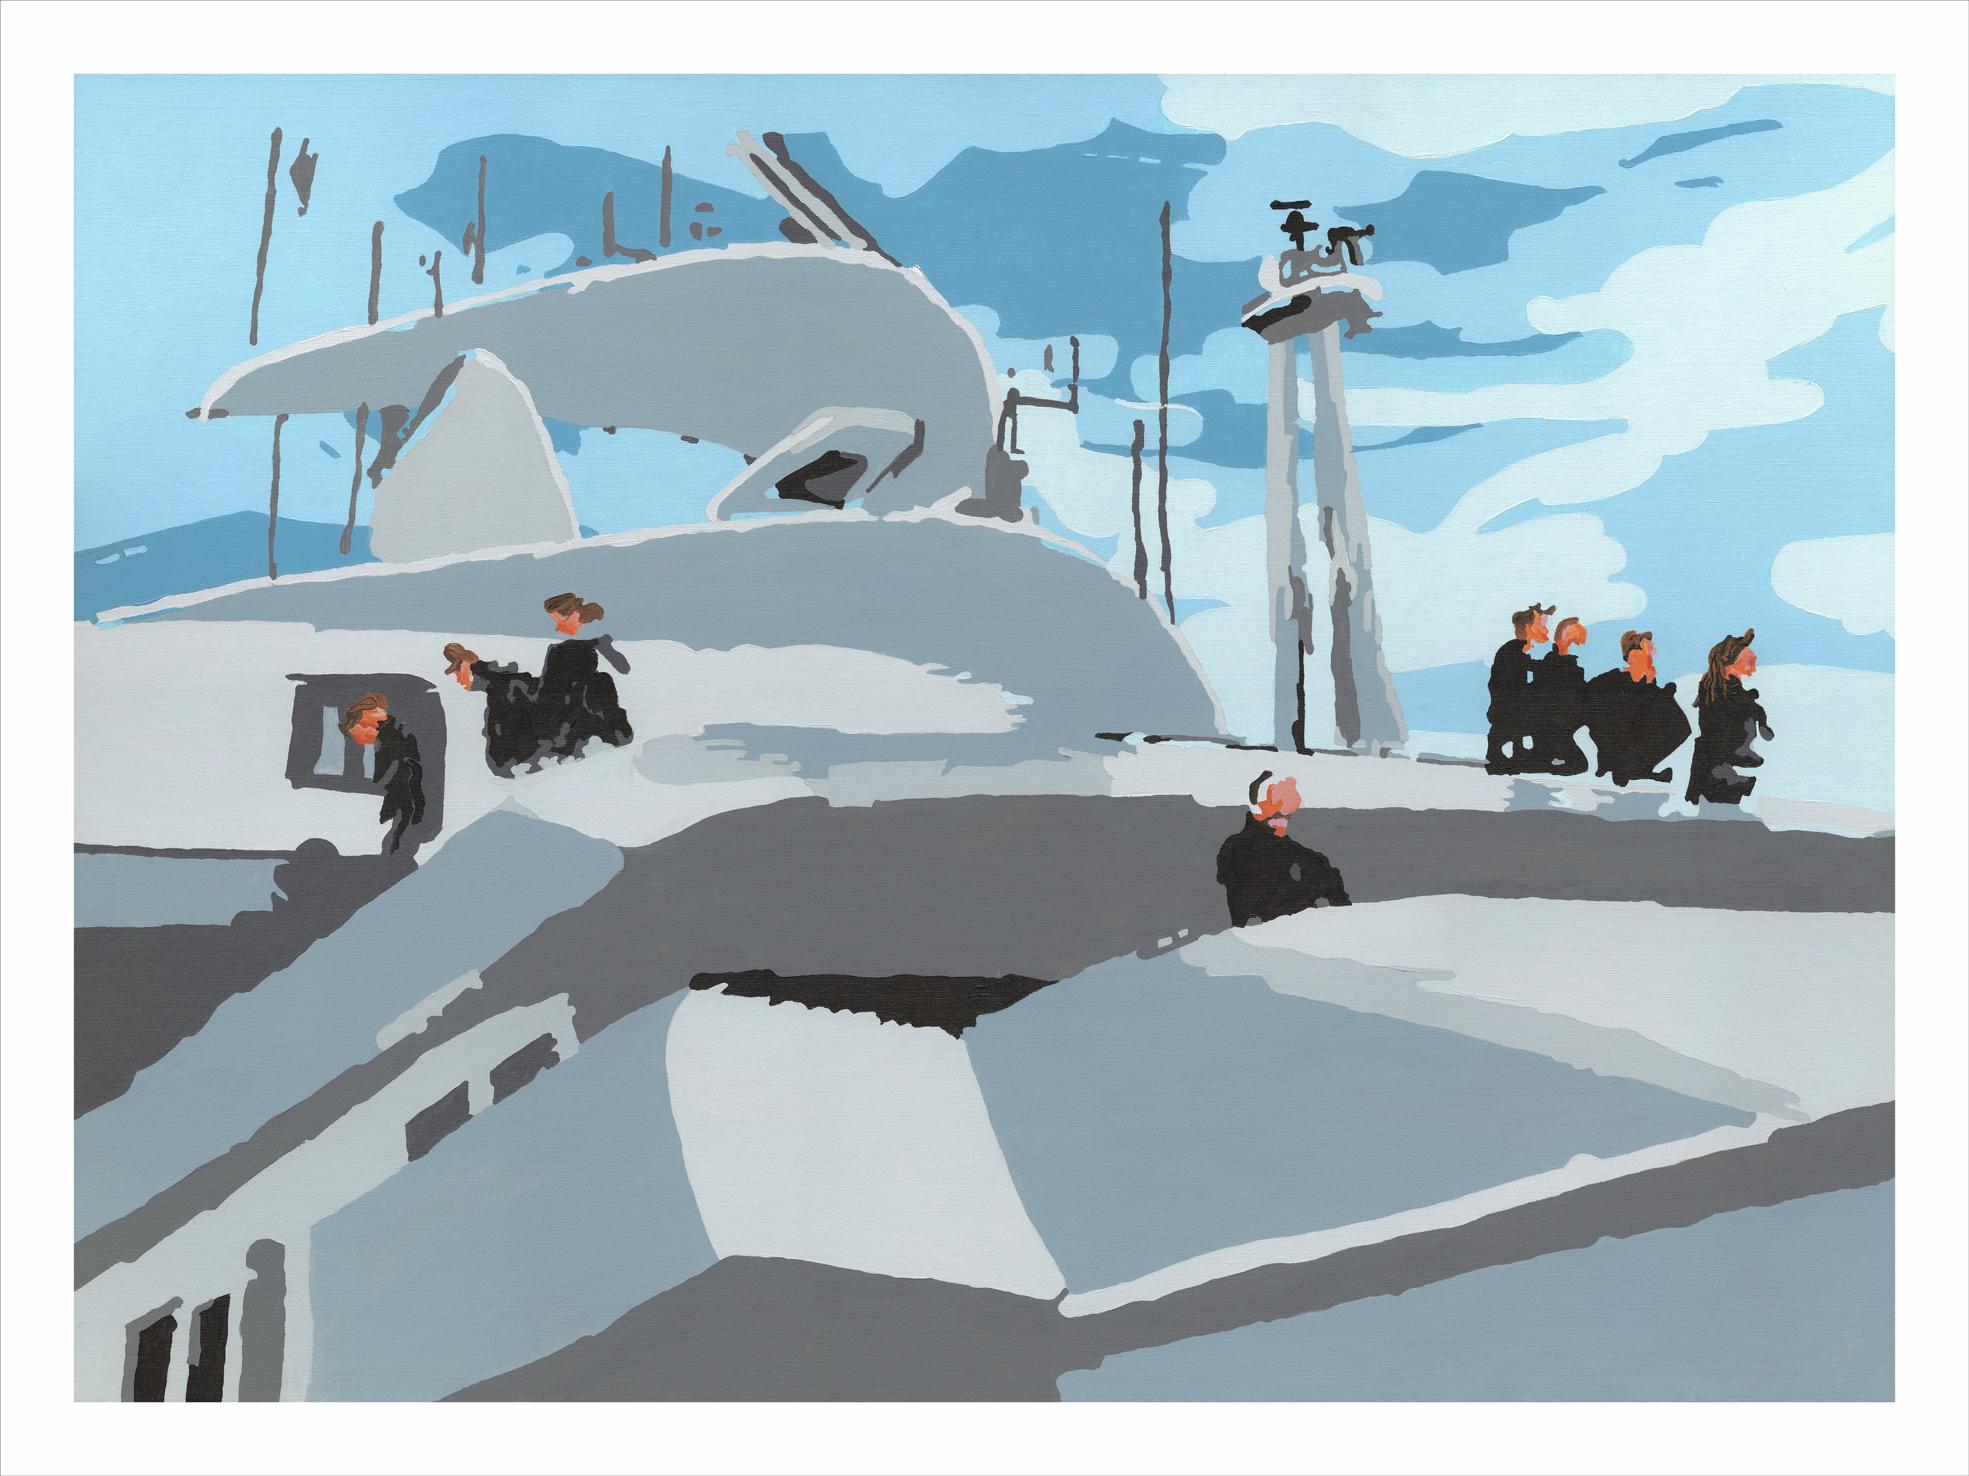 St Malo - Passerelle du Cruiser Expl